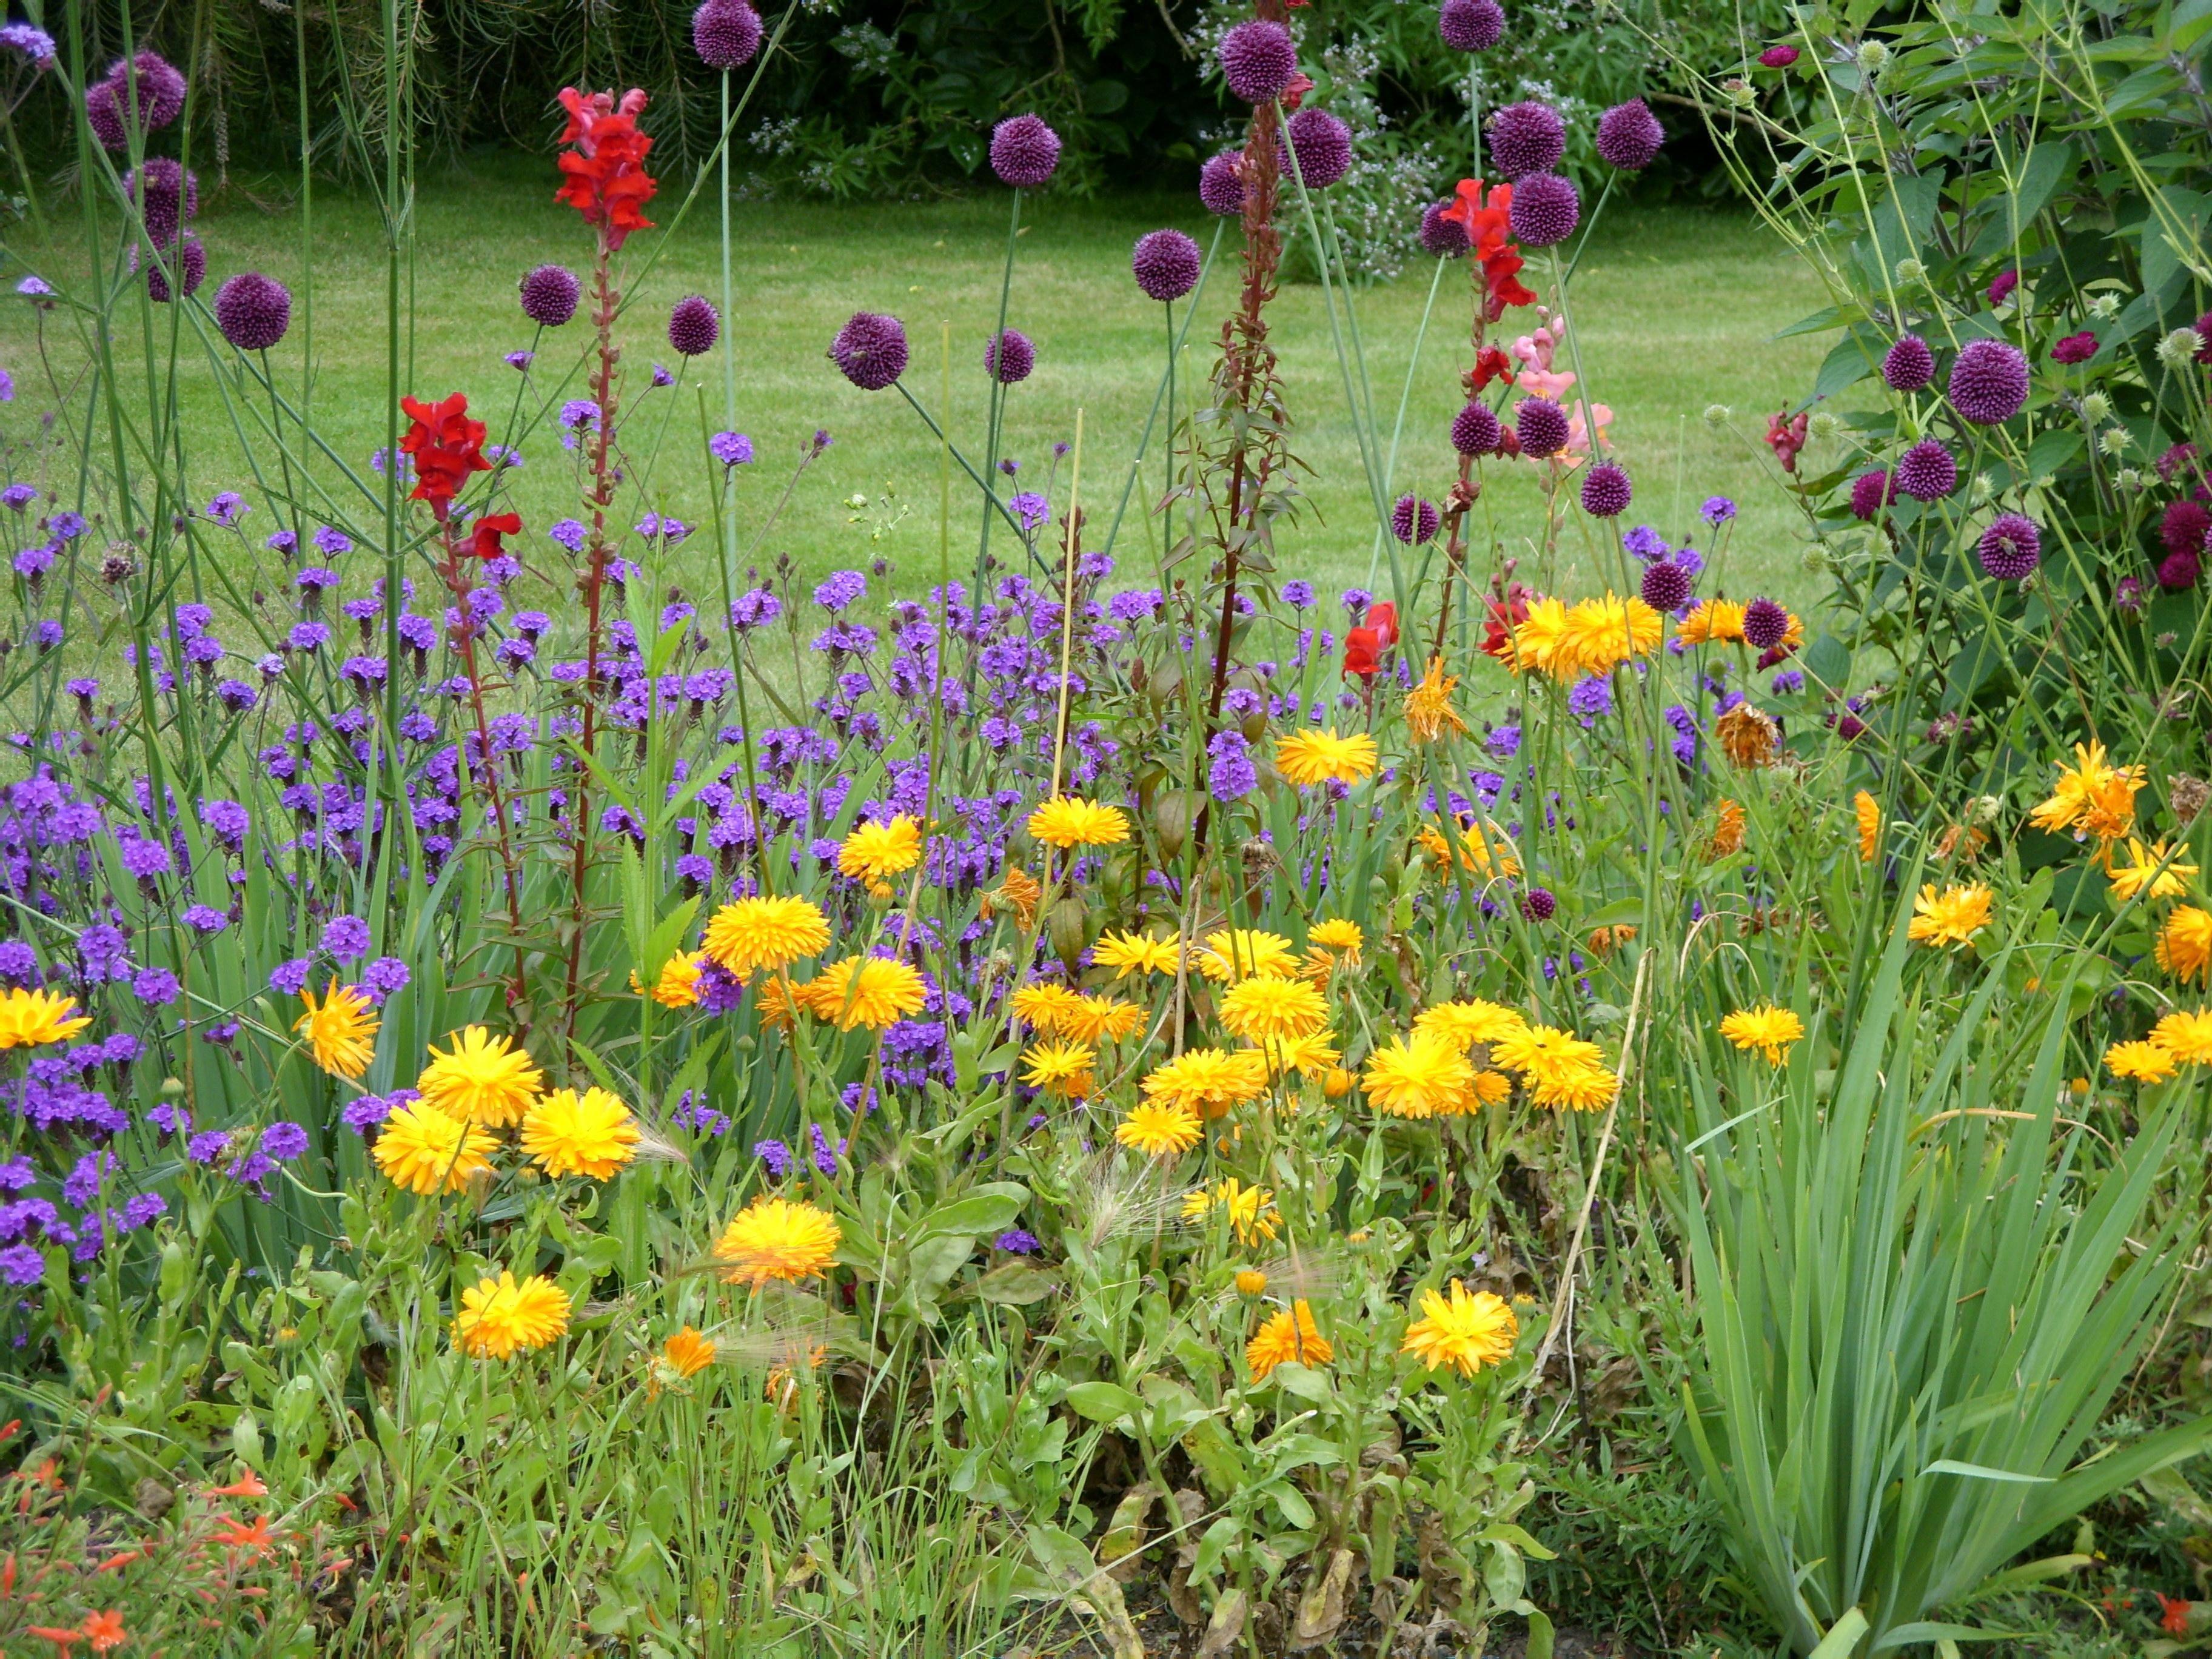 Killing weeds in flower beds - Killing Weeds In Flower Beds 32